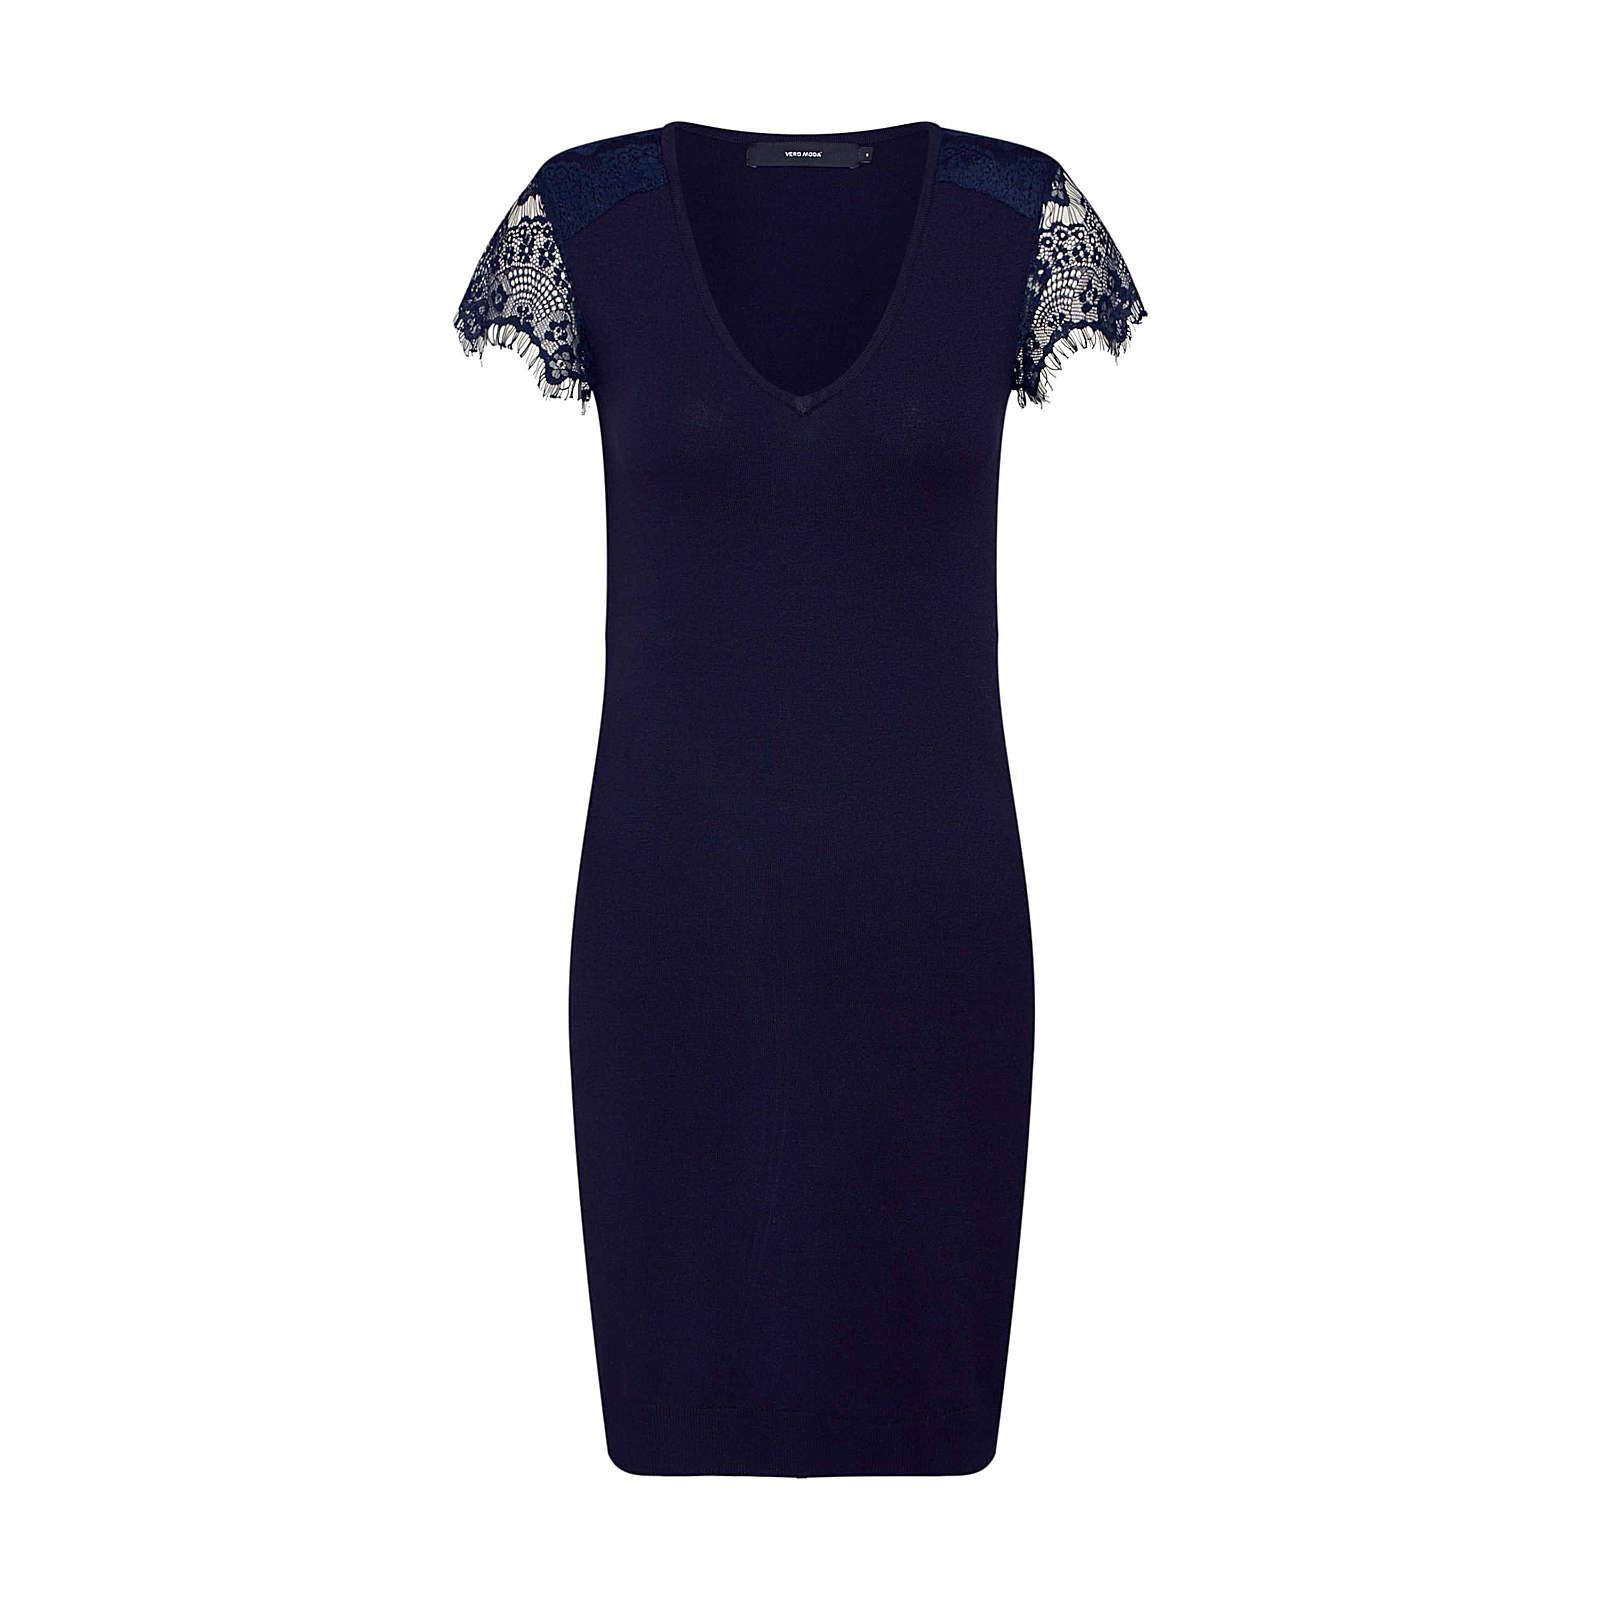 VERO MODA Kleid VMLASSI GLORY SS V-NECK DRESS Jerseykleider blau Damen Gr. 38